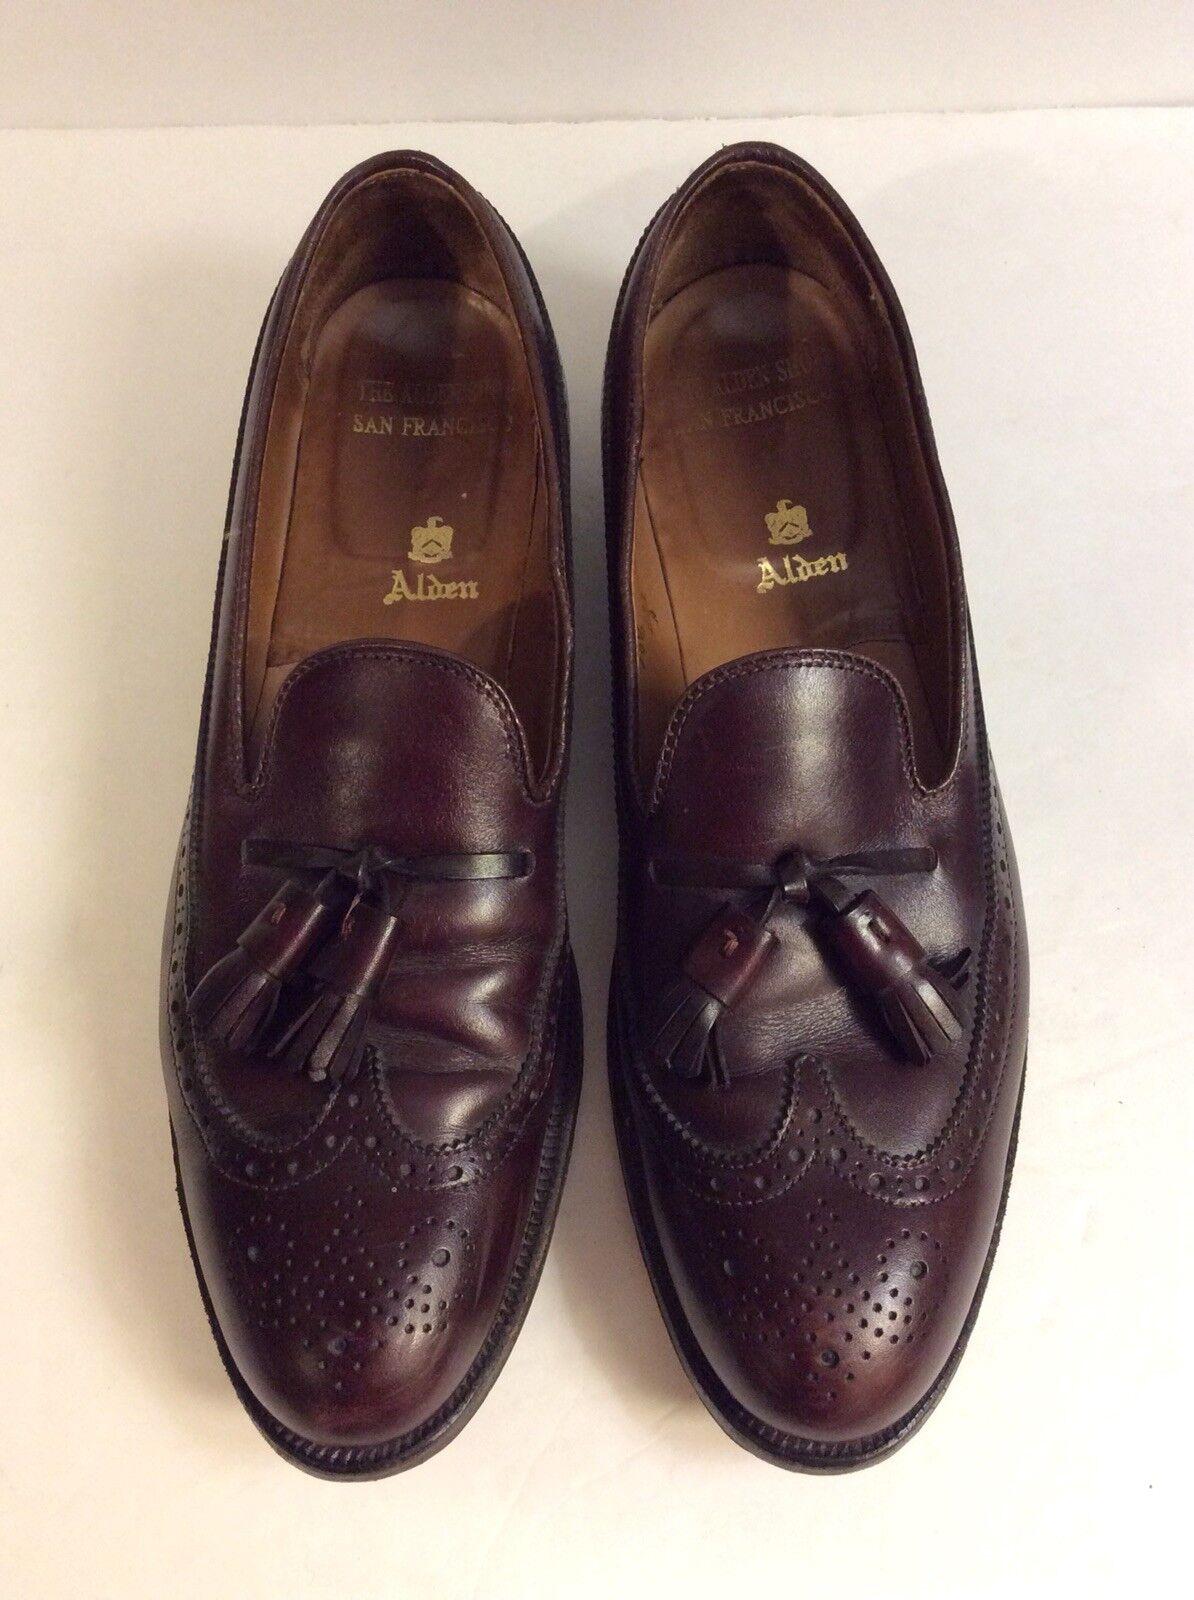 Alden Brown Leather Tassel Loafers Dress shoes Men's Sz 10.5 AAA